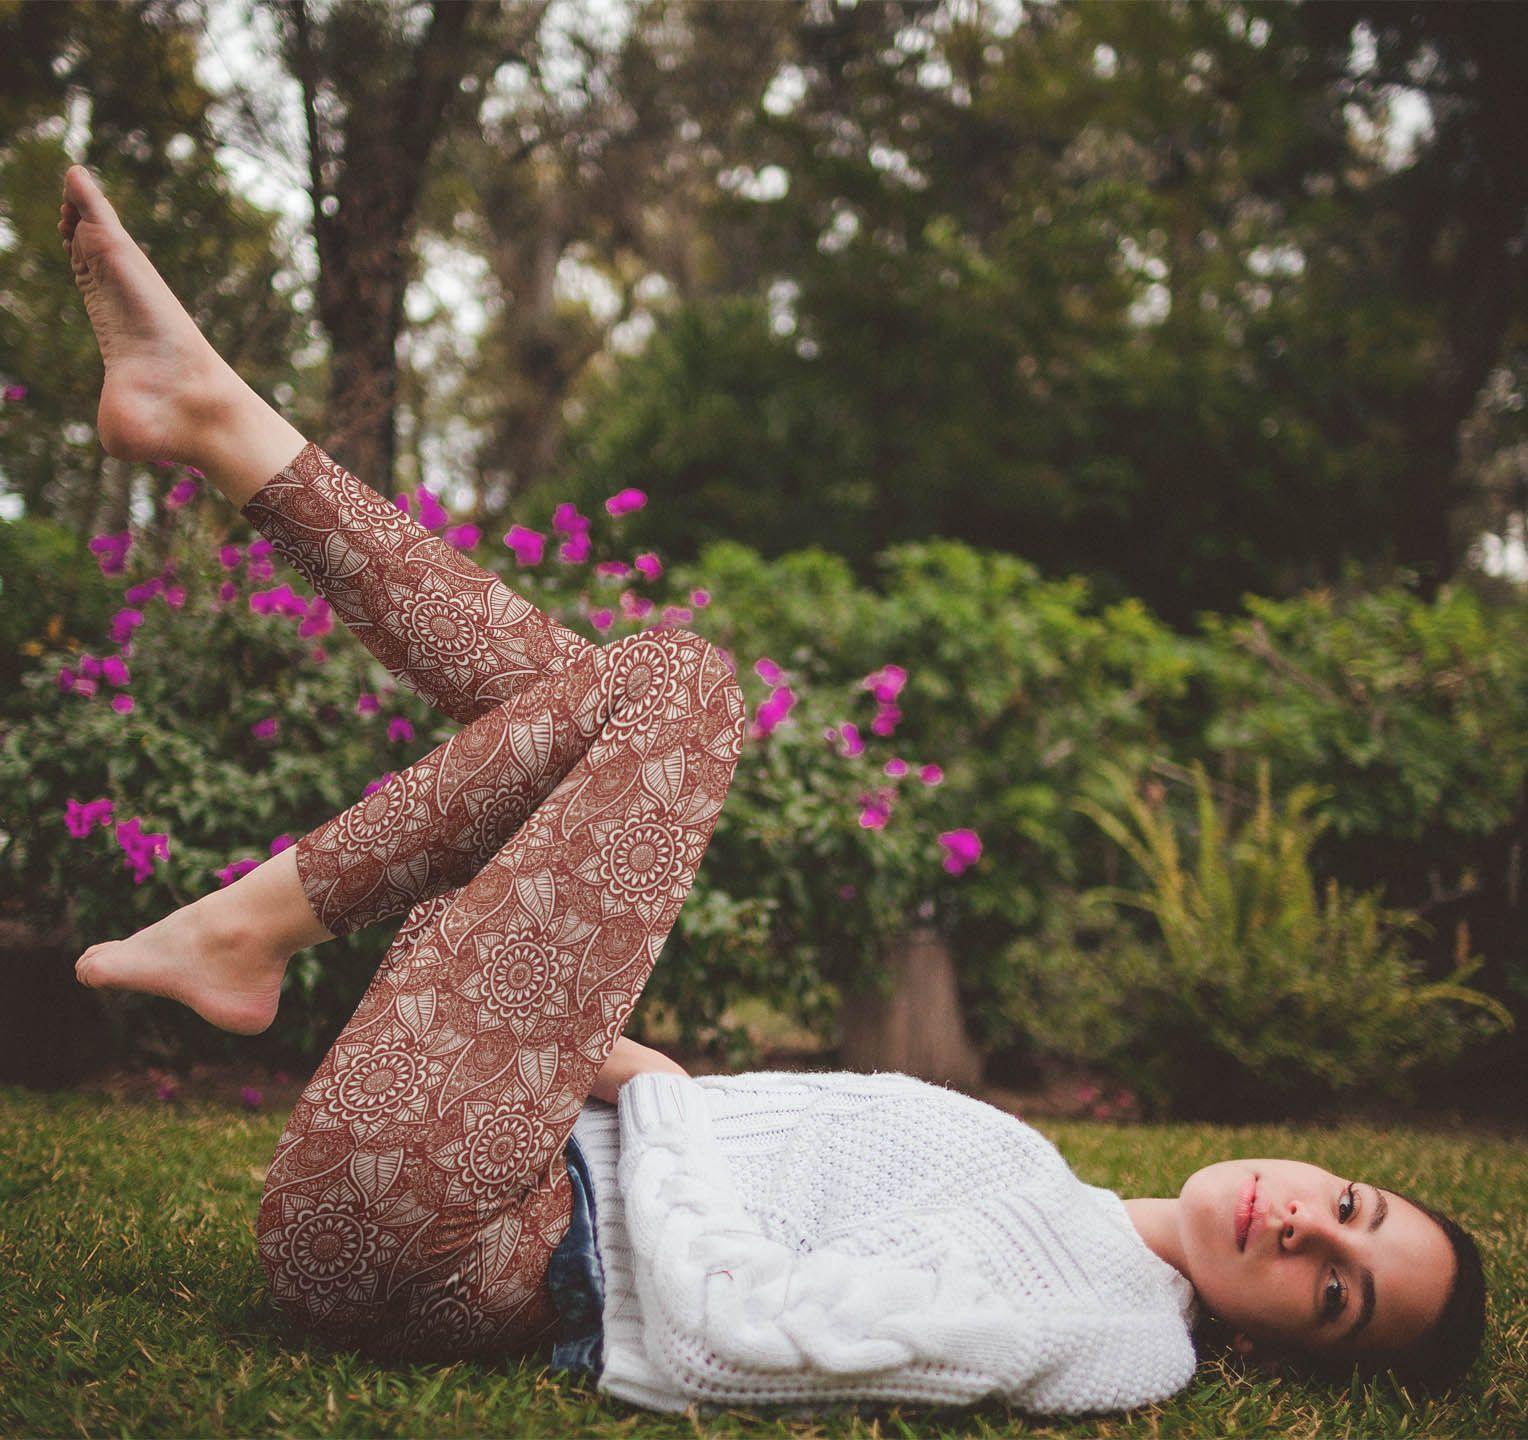 eca44976292f0f Ornamental Design mehndi design yoga leggings. Vosenta #Mehndi Collection  Yoga Leggings $52.90 #style